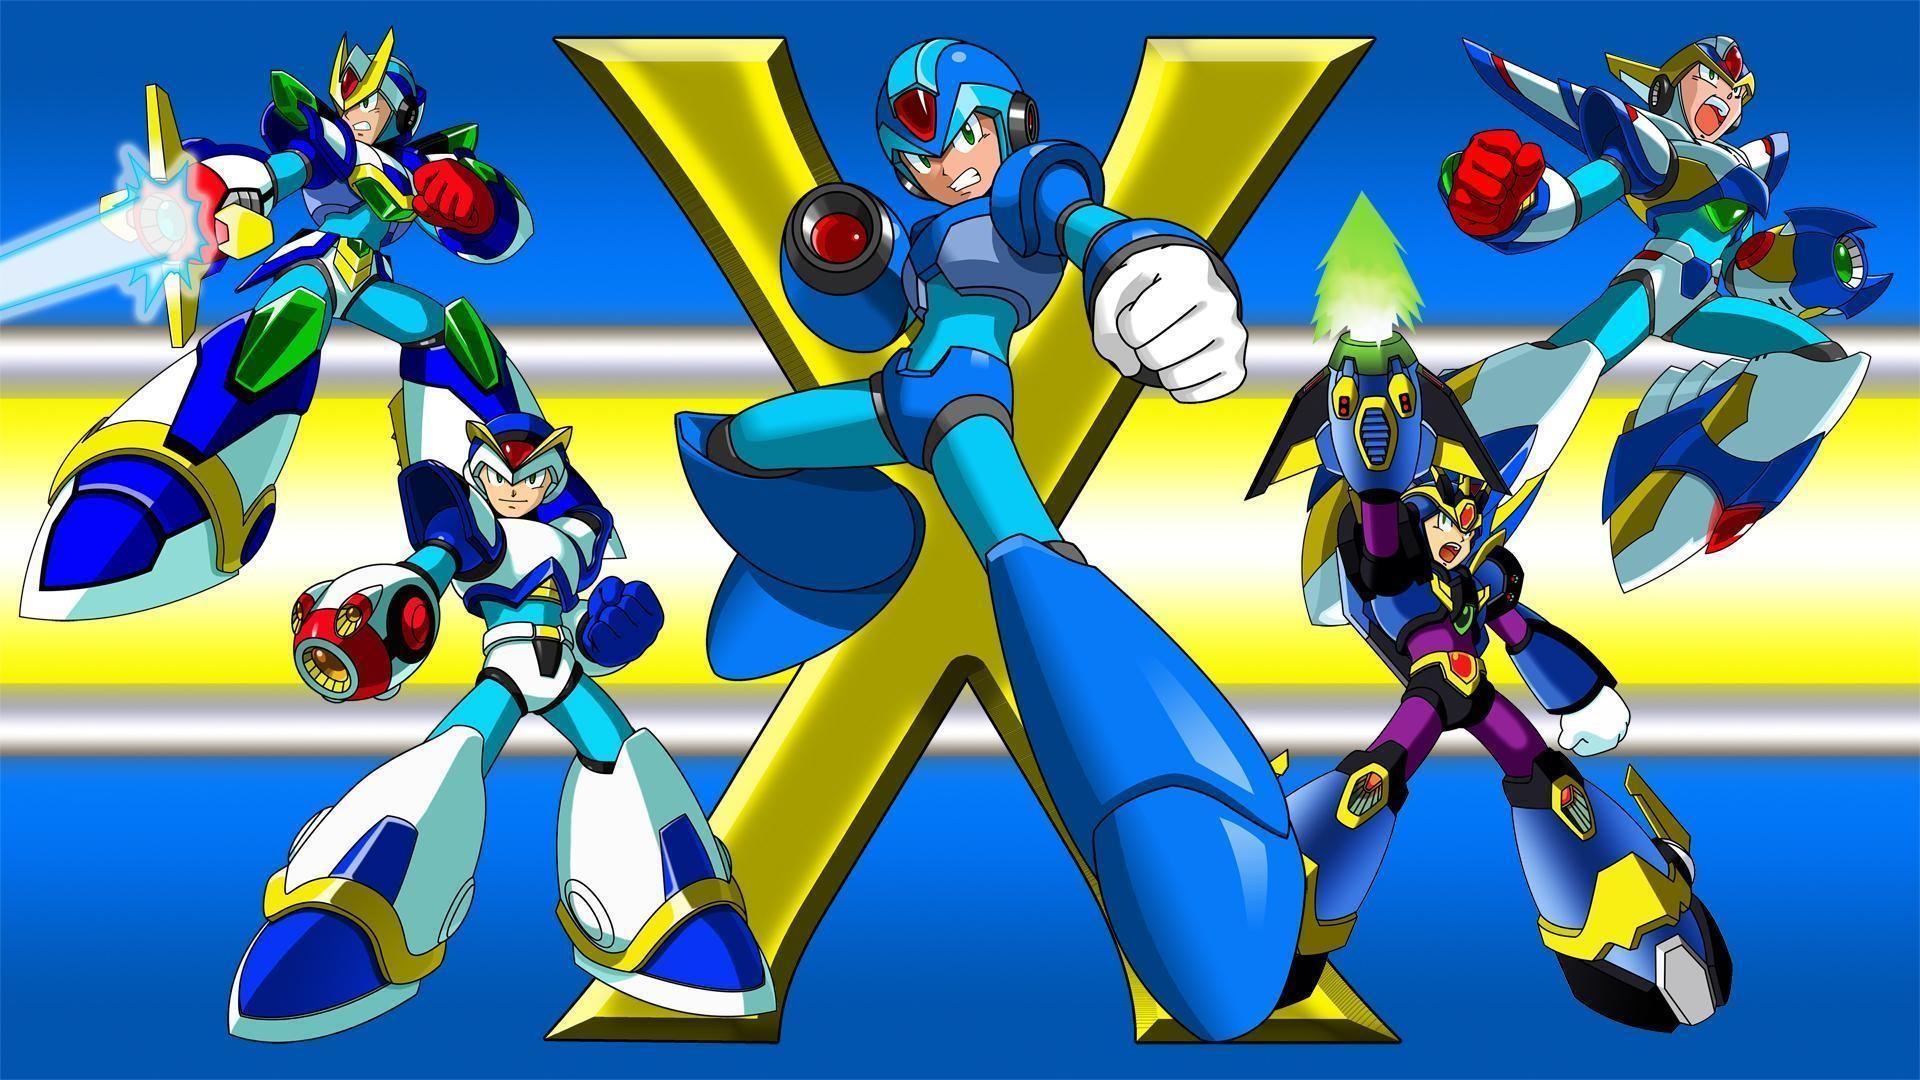 Mega Man X8 Background Free Download by Donella Kanter